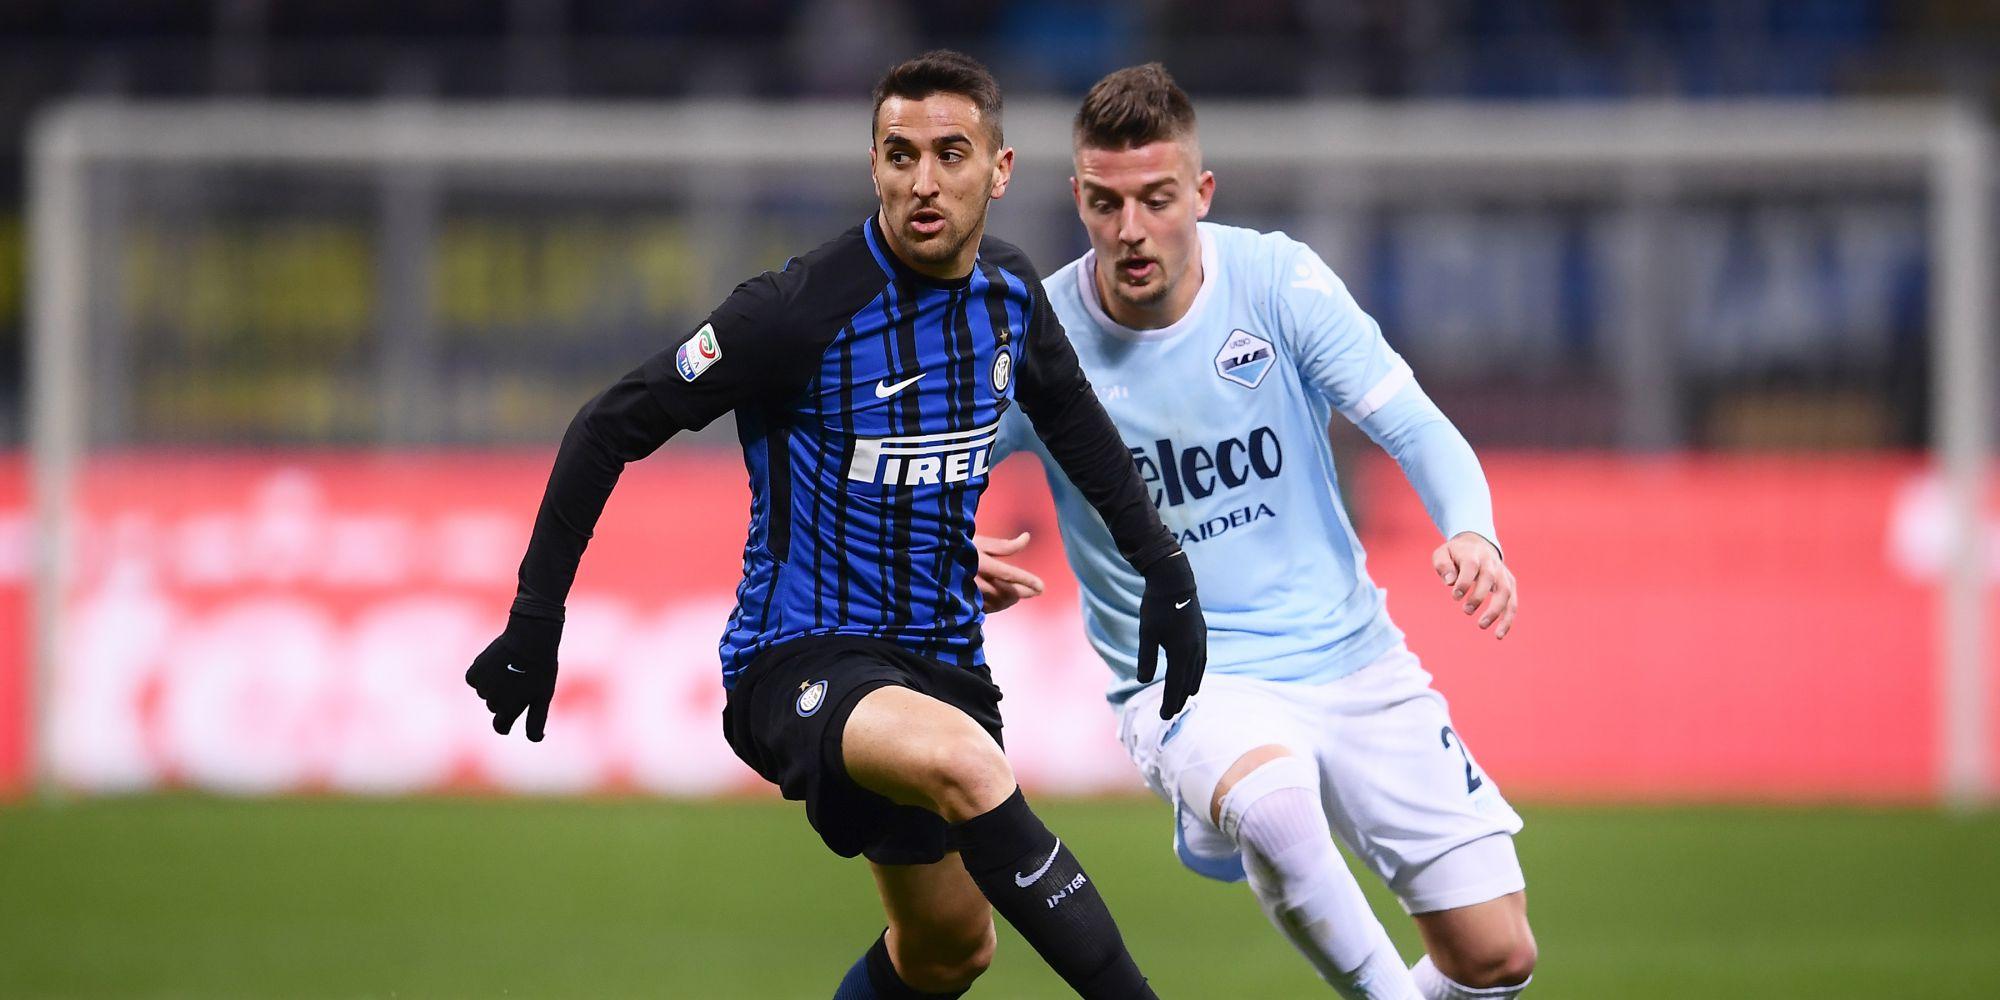 Matias Vecino Sergej Milinkovic-Savic Inter Lazio Serie A